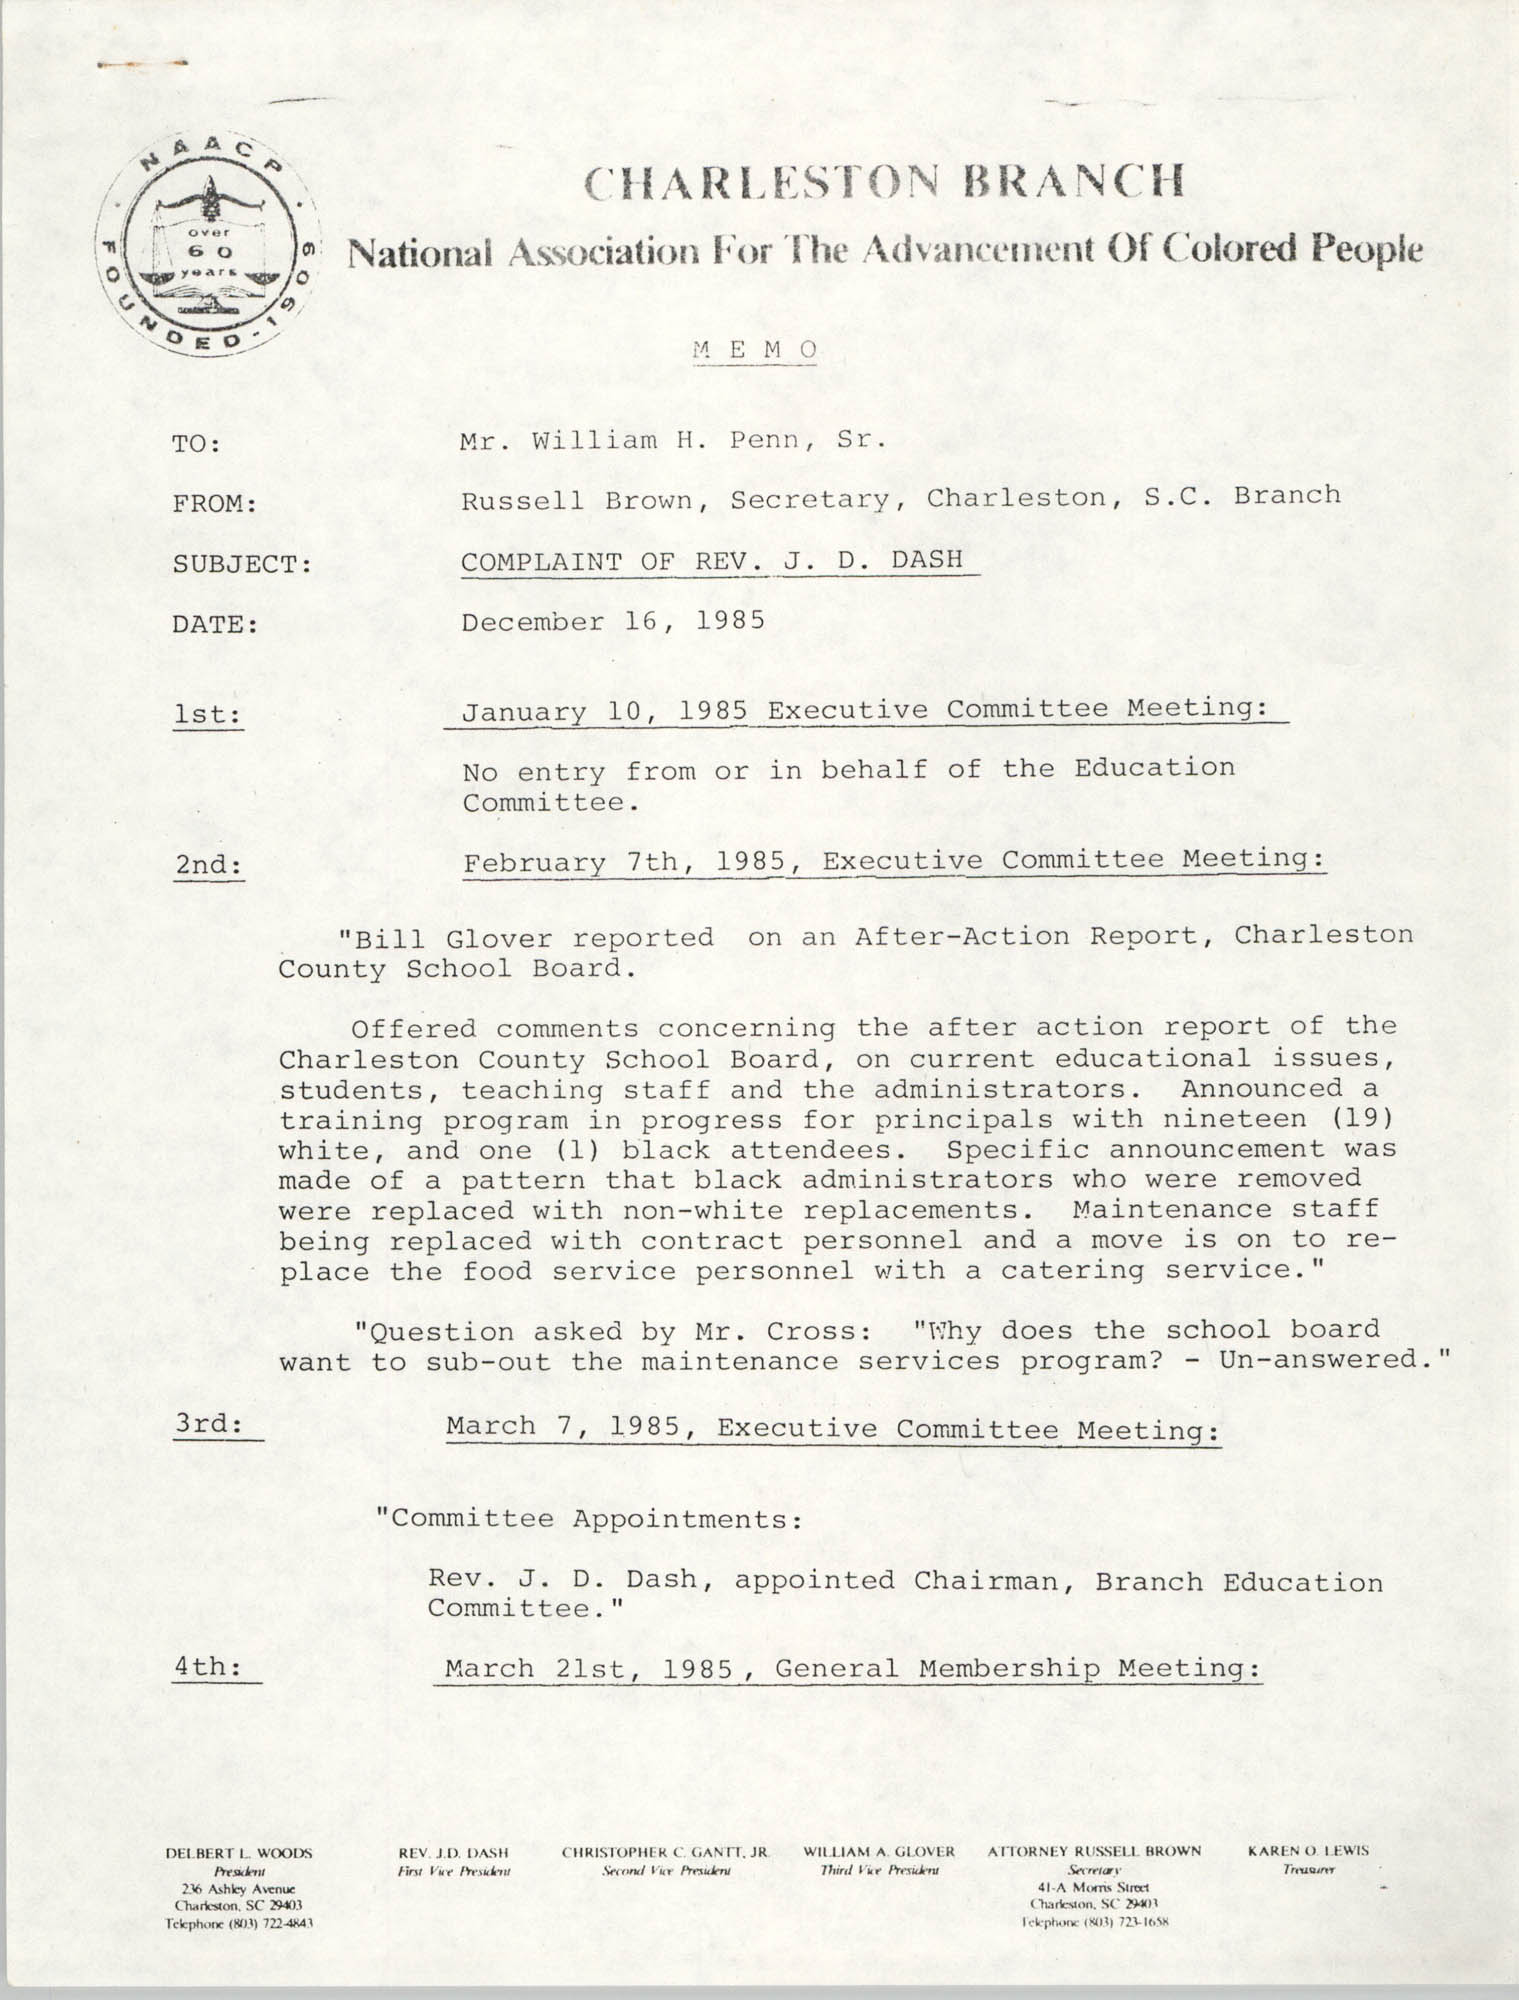 Charleston Branch of the NAACP Memorandum, December 16, 1985, Page 1